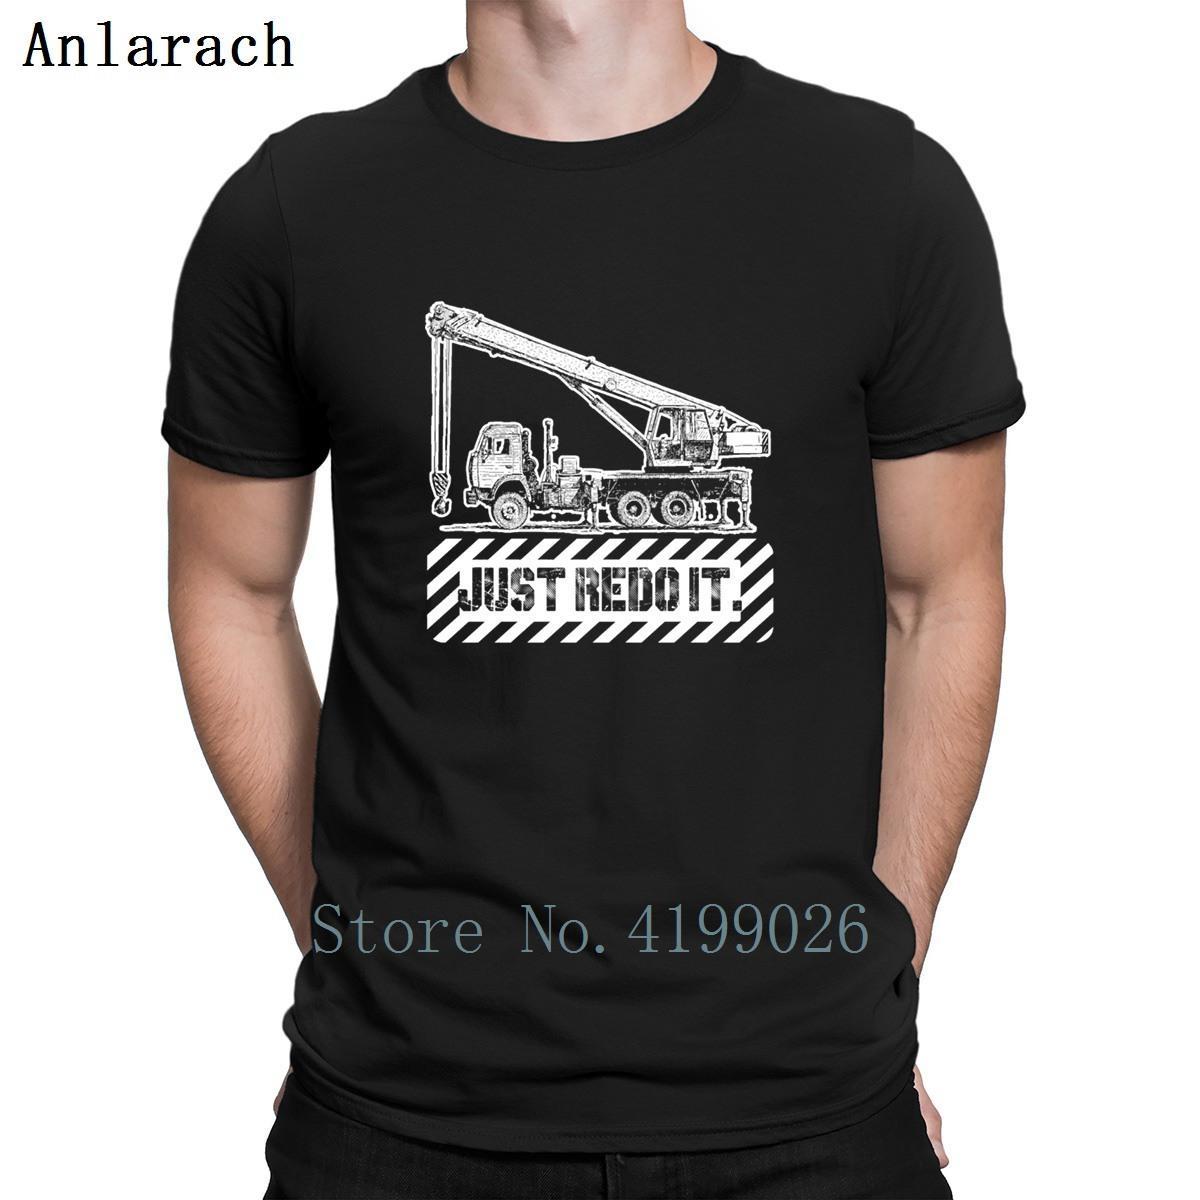 696263565 Crane Operator Tshirt New Fashion Clothing Formal Big Sizes Tshirt For Men  Fun Sunlight Print Summer Top One Tee A Day Random Graphic Tees From  Dzuprightc, ...